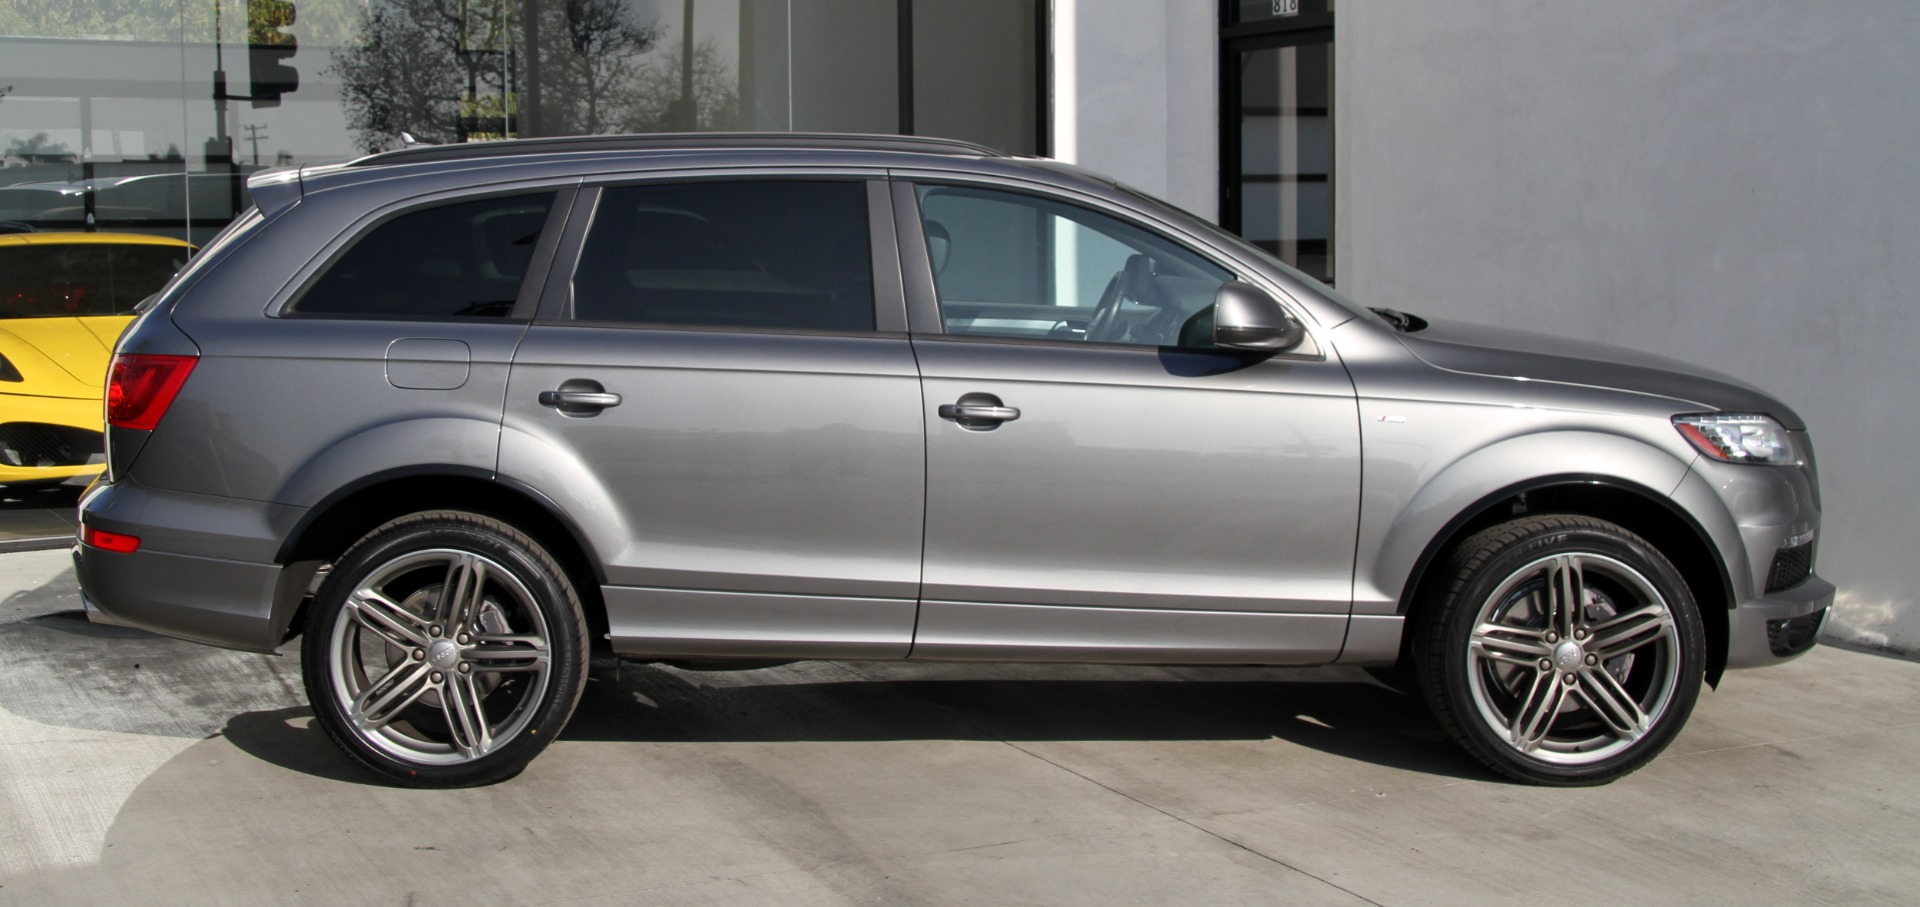 2014 Audi Q7 3.0 quattro TDI Prestige Stock # 6052 for sale near Redondo Beach, CA | CA Audi Dealer